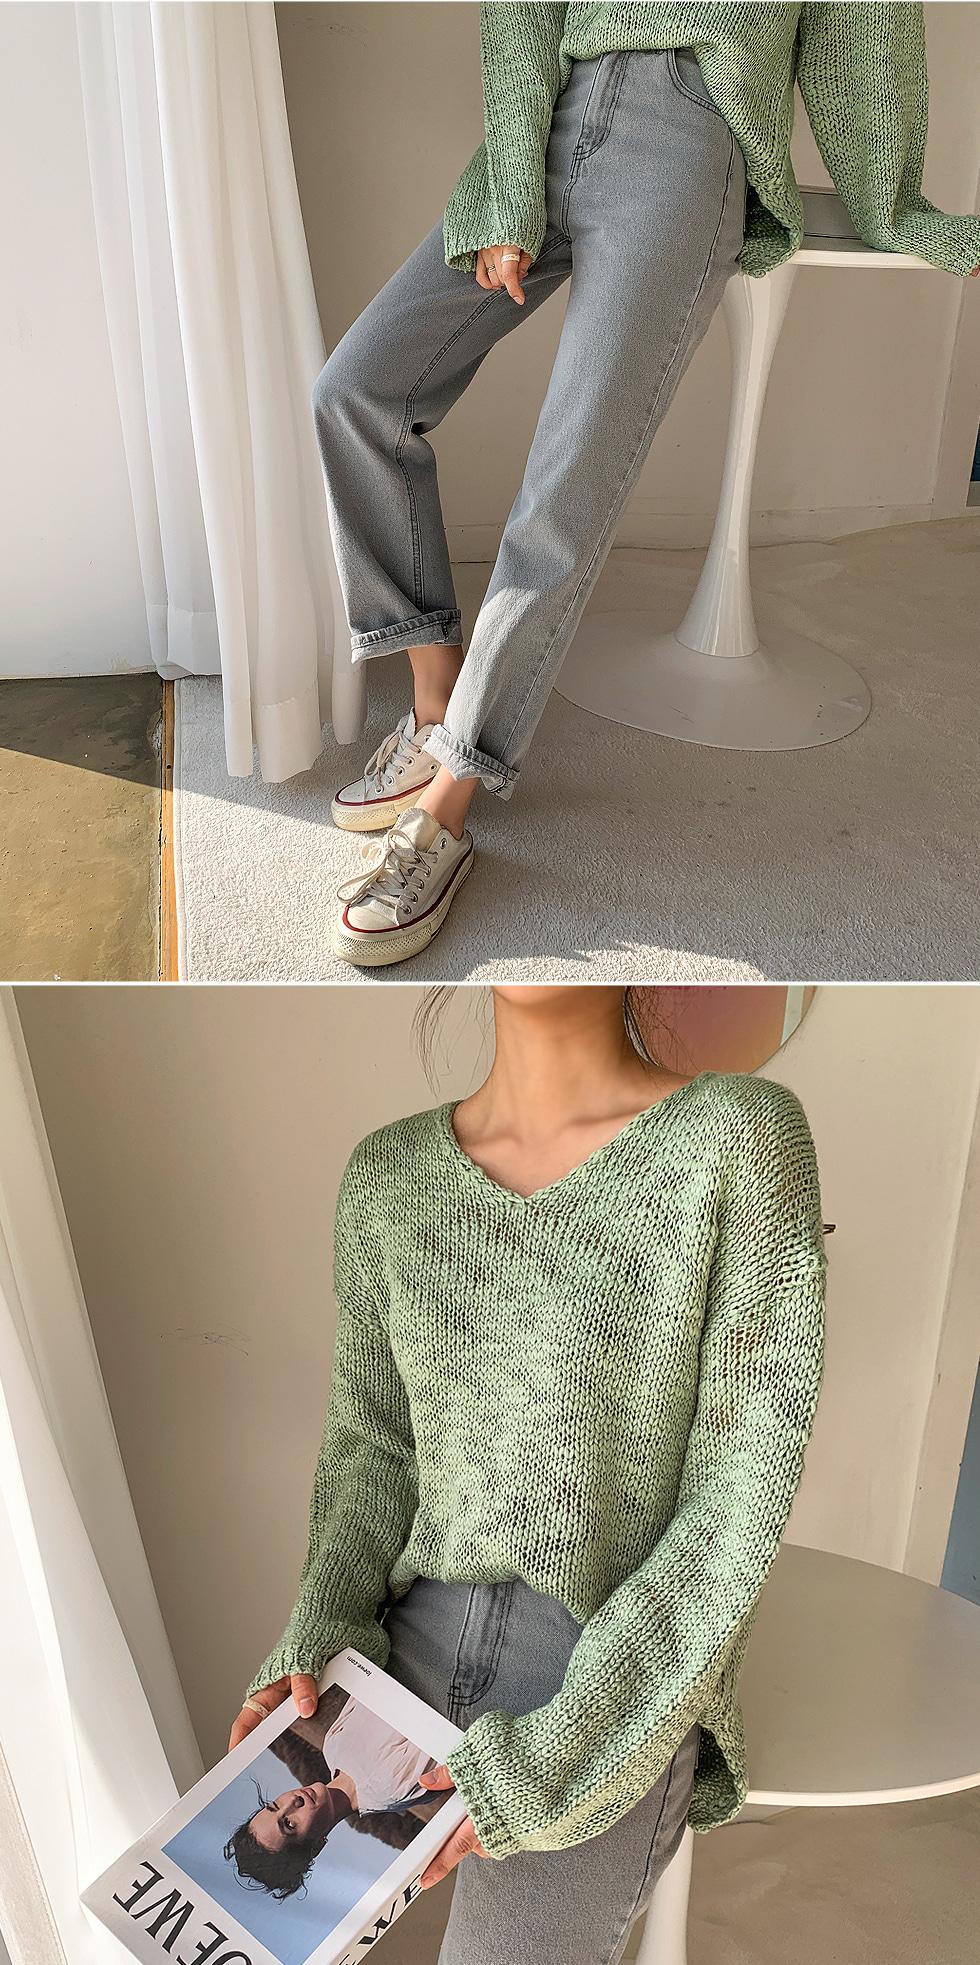 Pring V-Line Knitwear